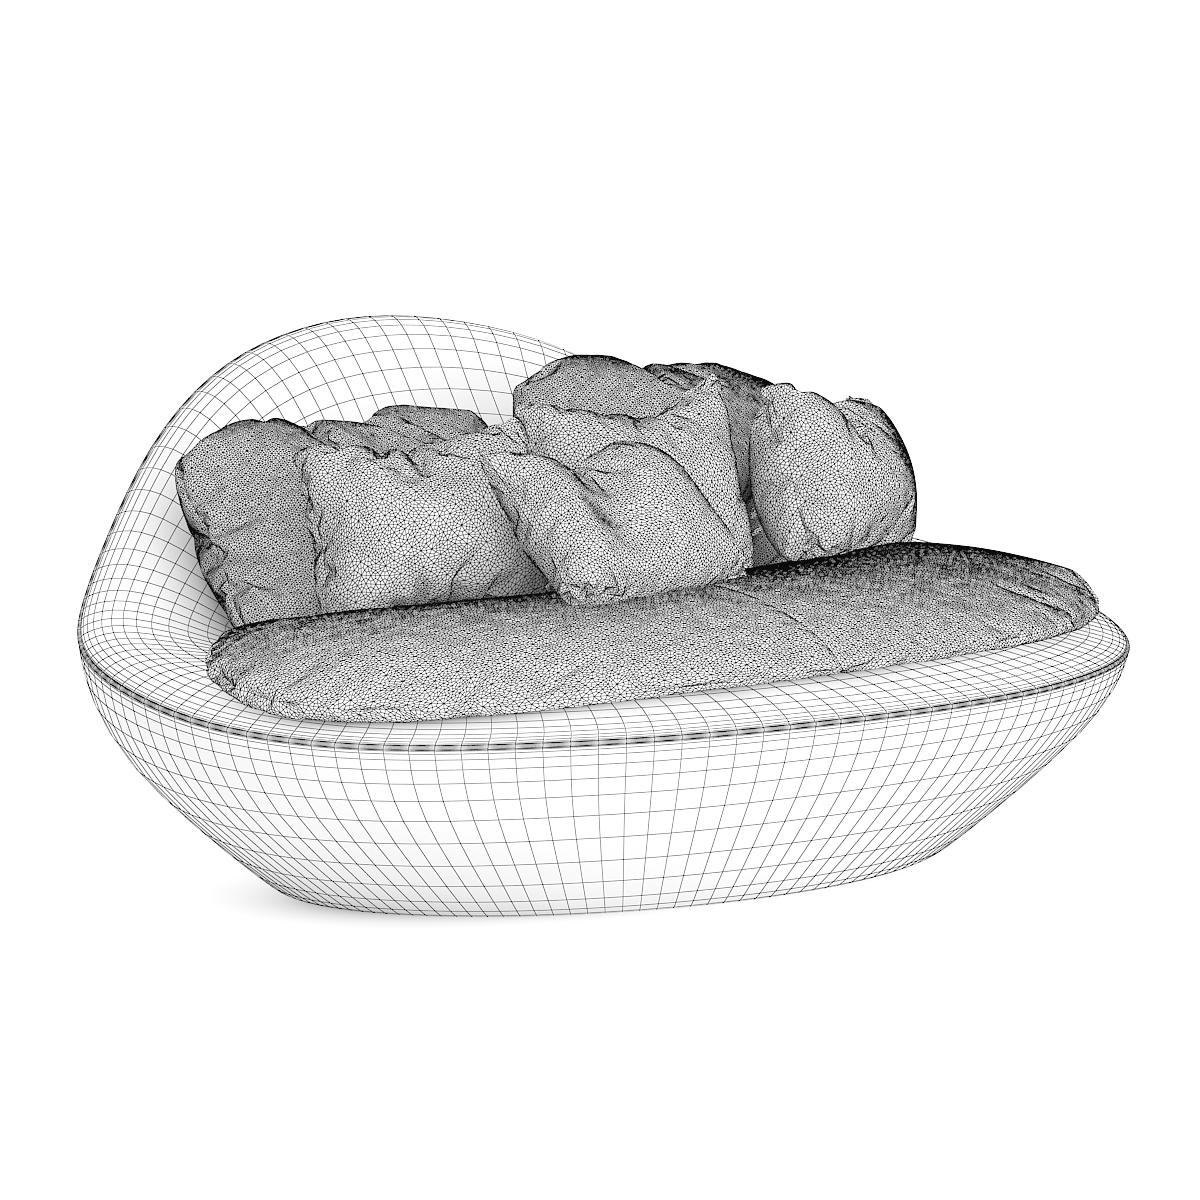 Round Sofa with Pillows